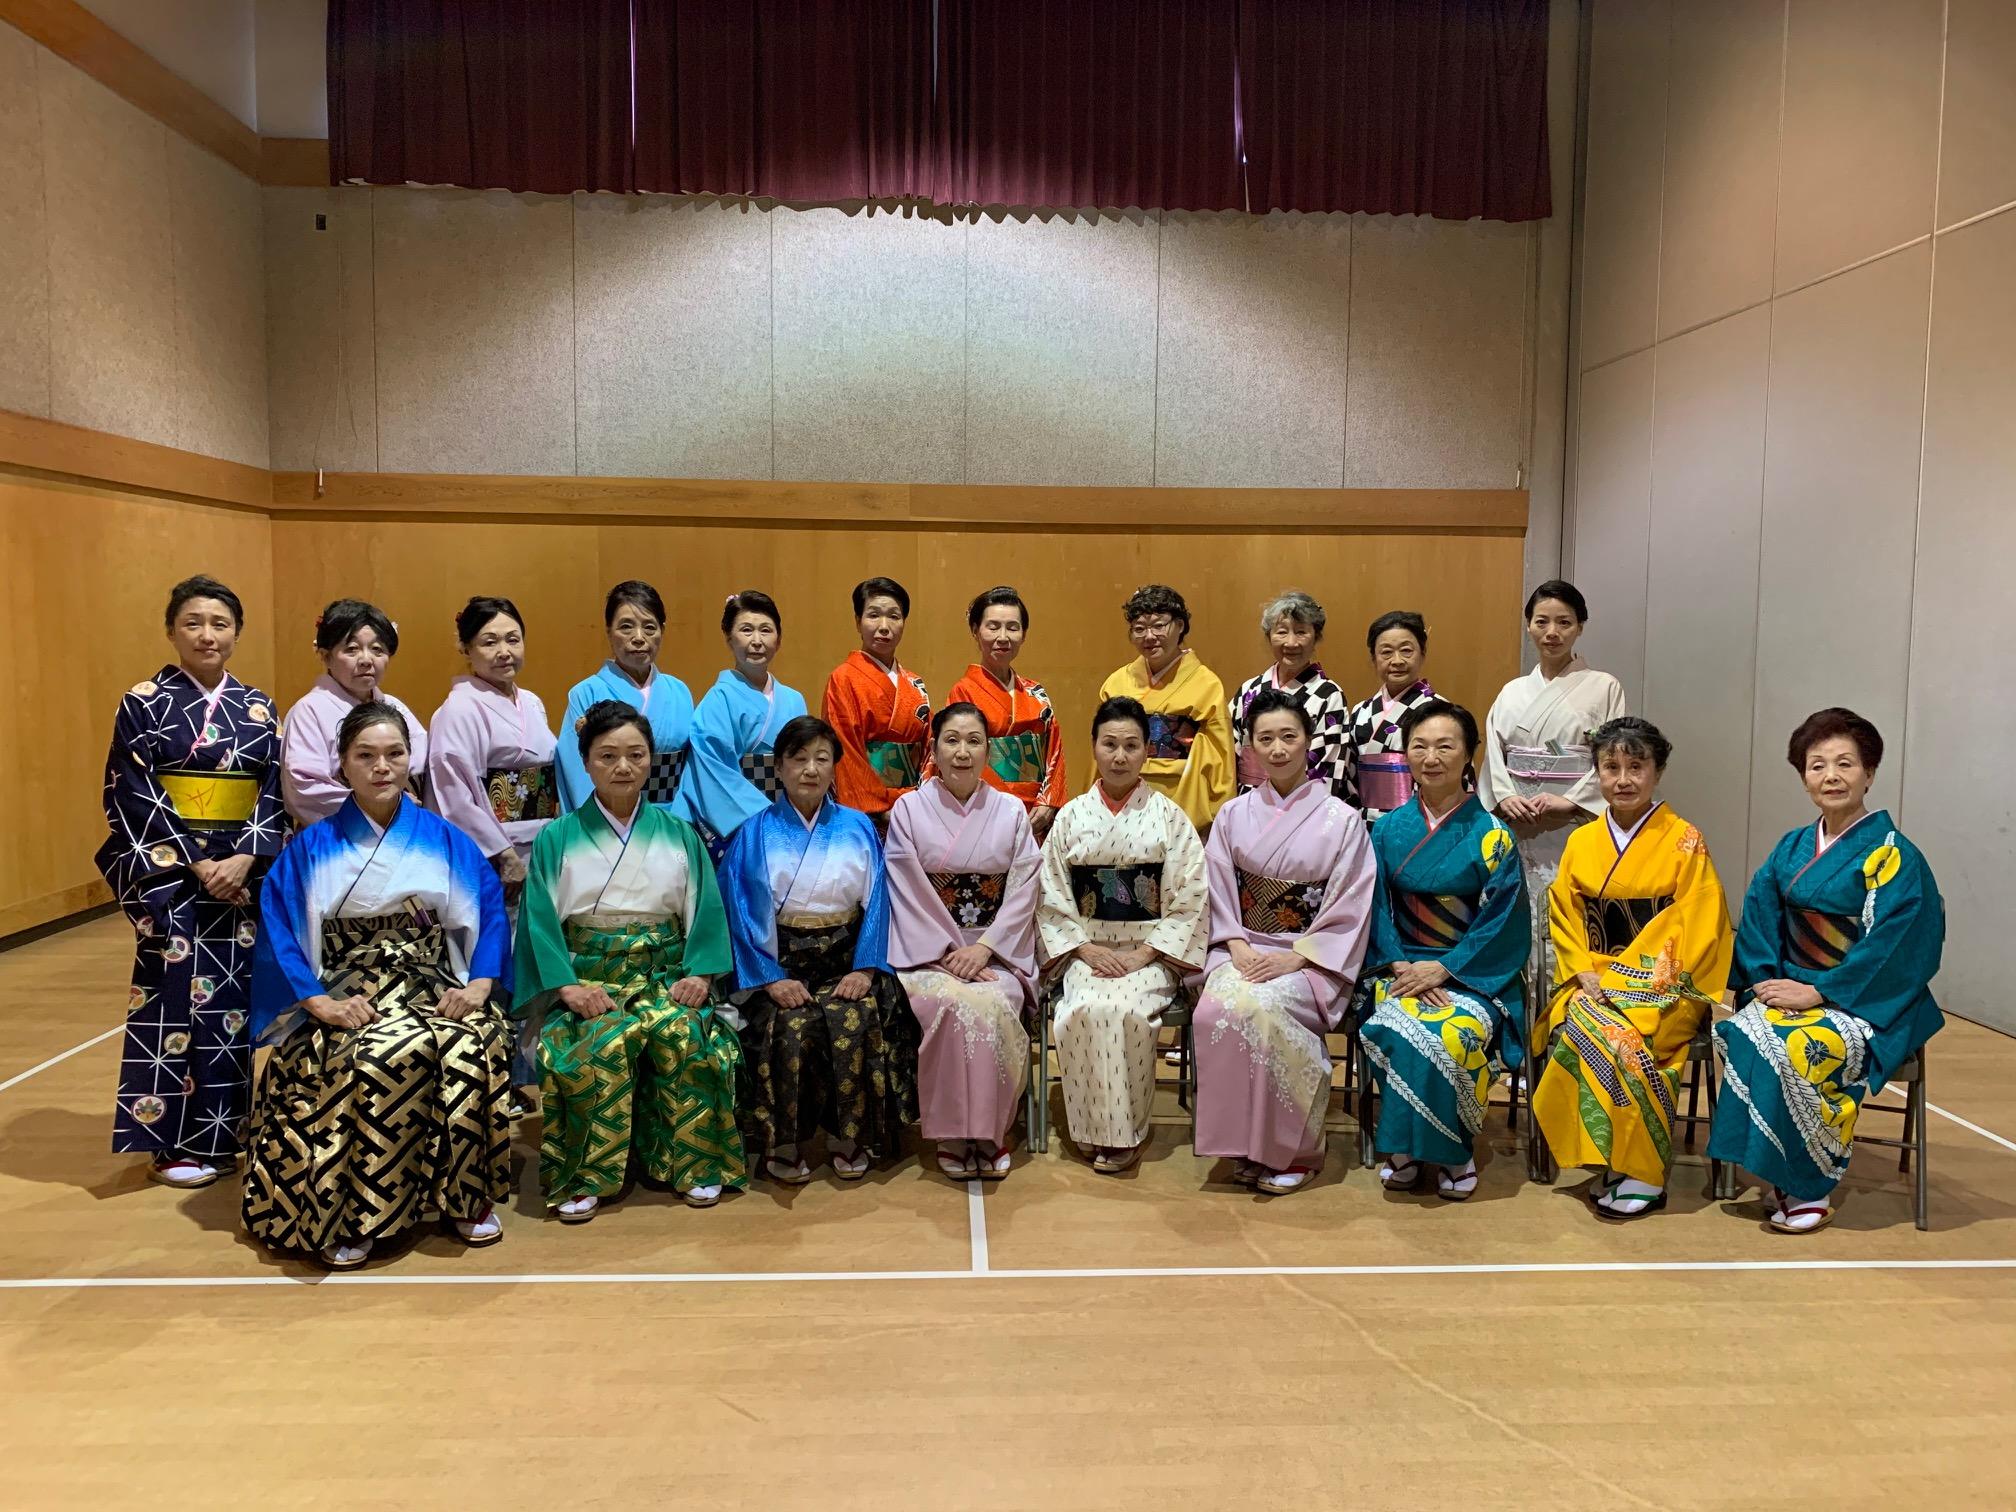 Yoko Matsuno and Friends (Satsuki-kai) share Japanese dance through popular Nikkei Centre events and our Taiken education program